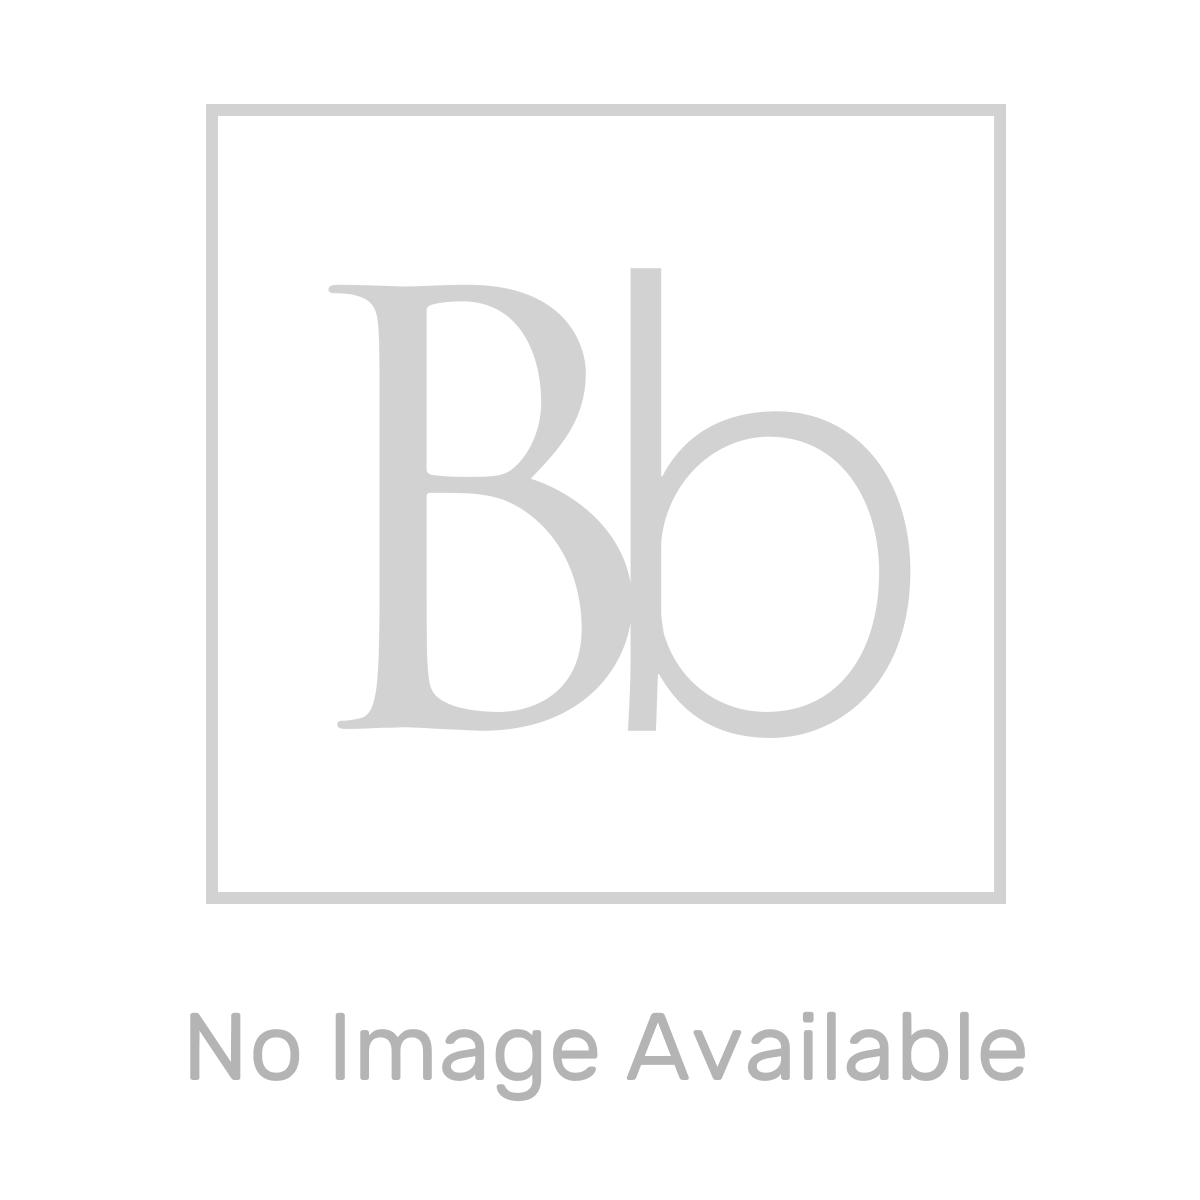 Aquadart Offset Quadrant 1200 x 900 Shower Tray Left Handed Line Drawing